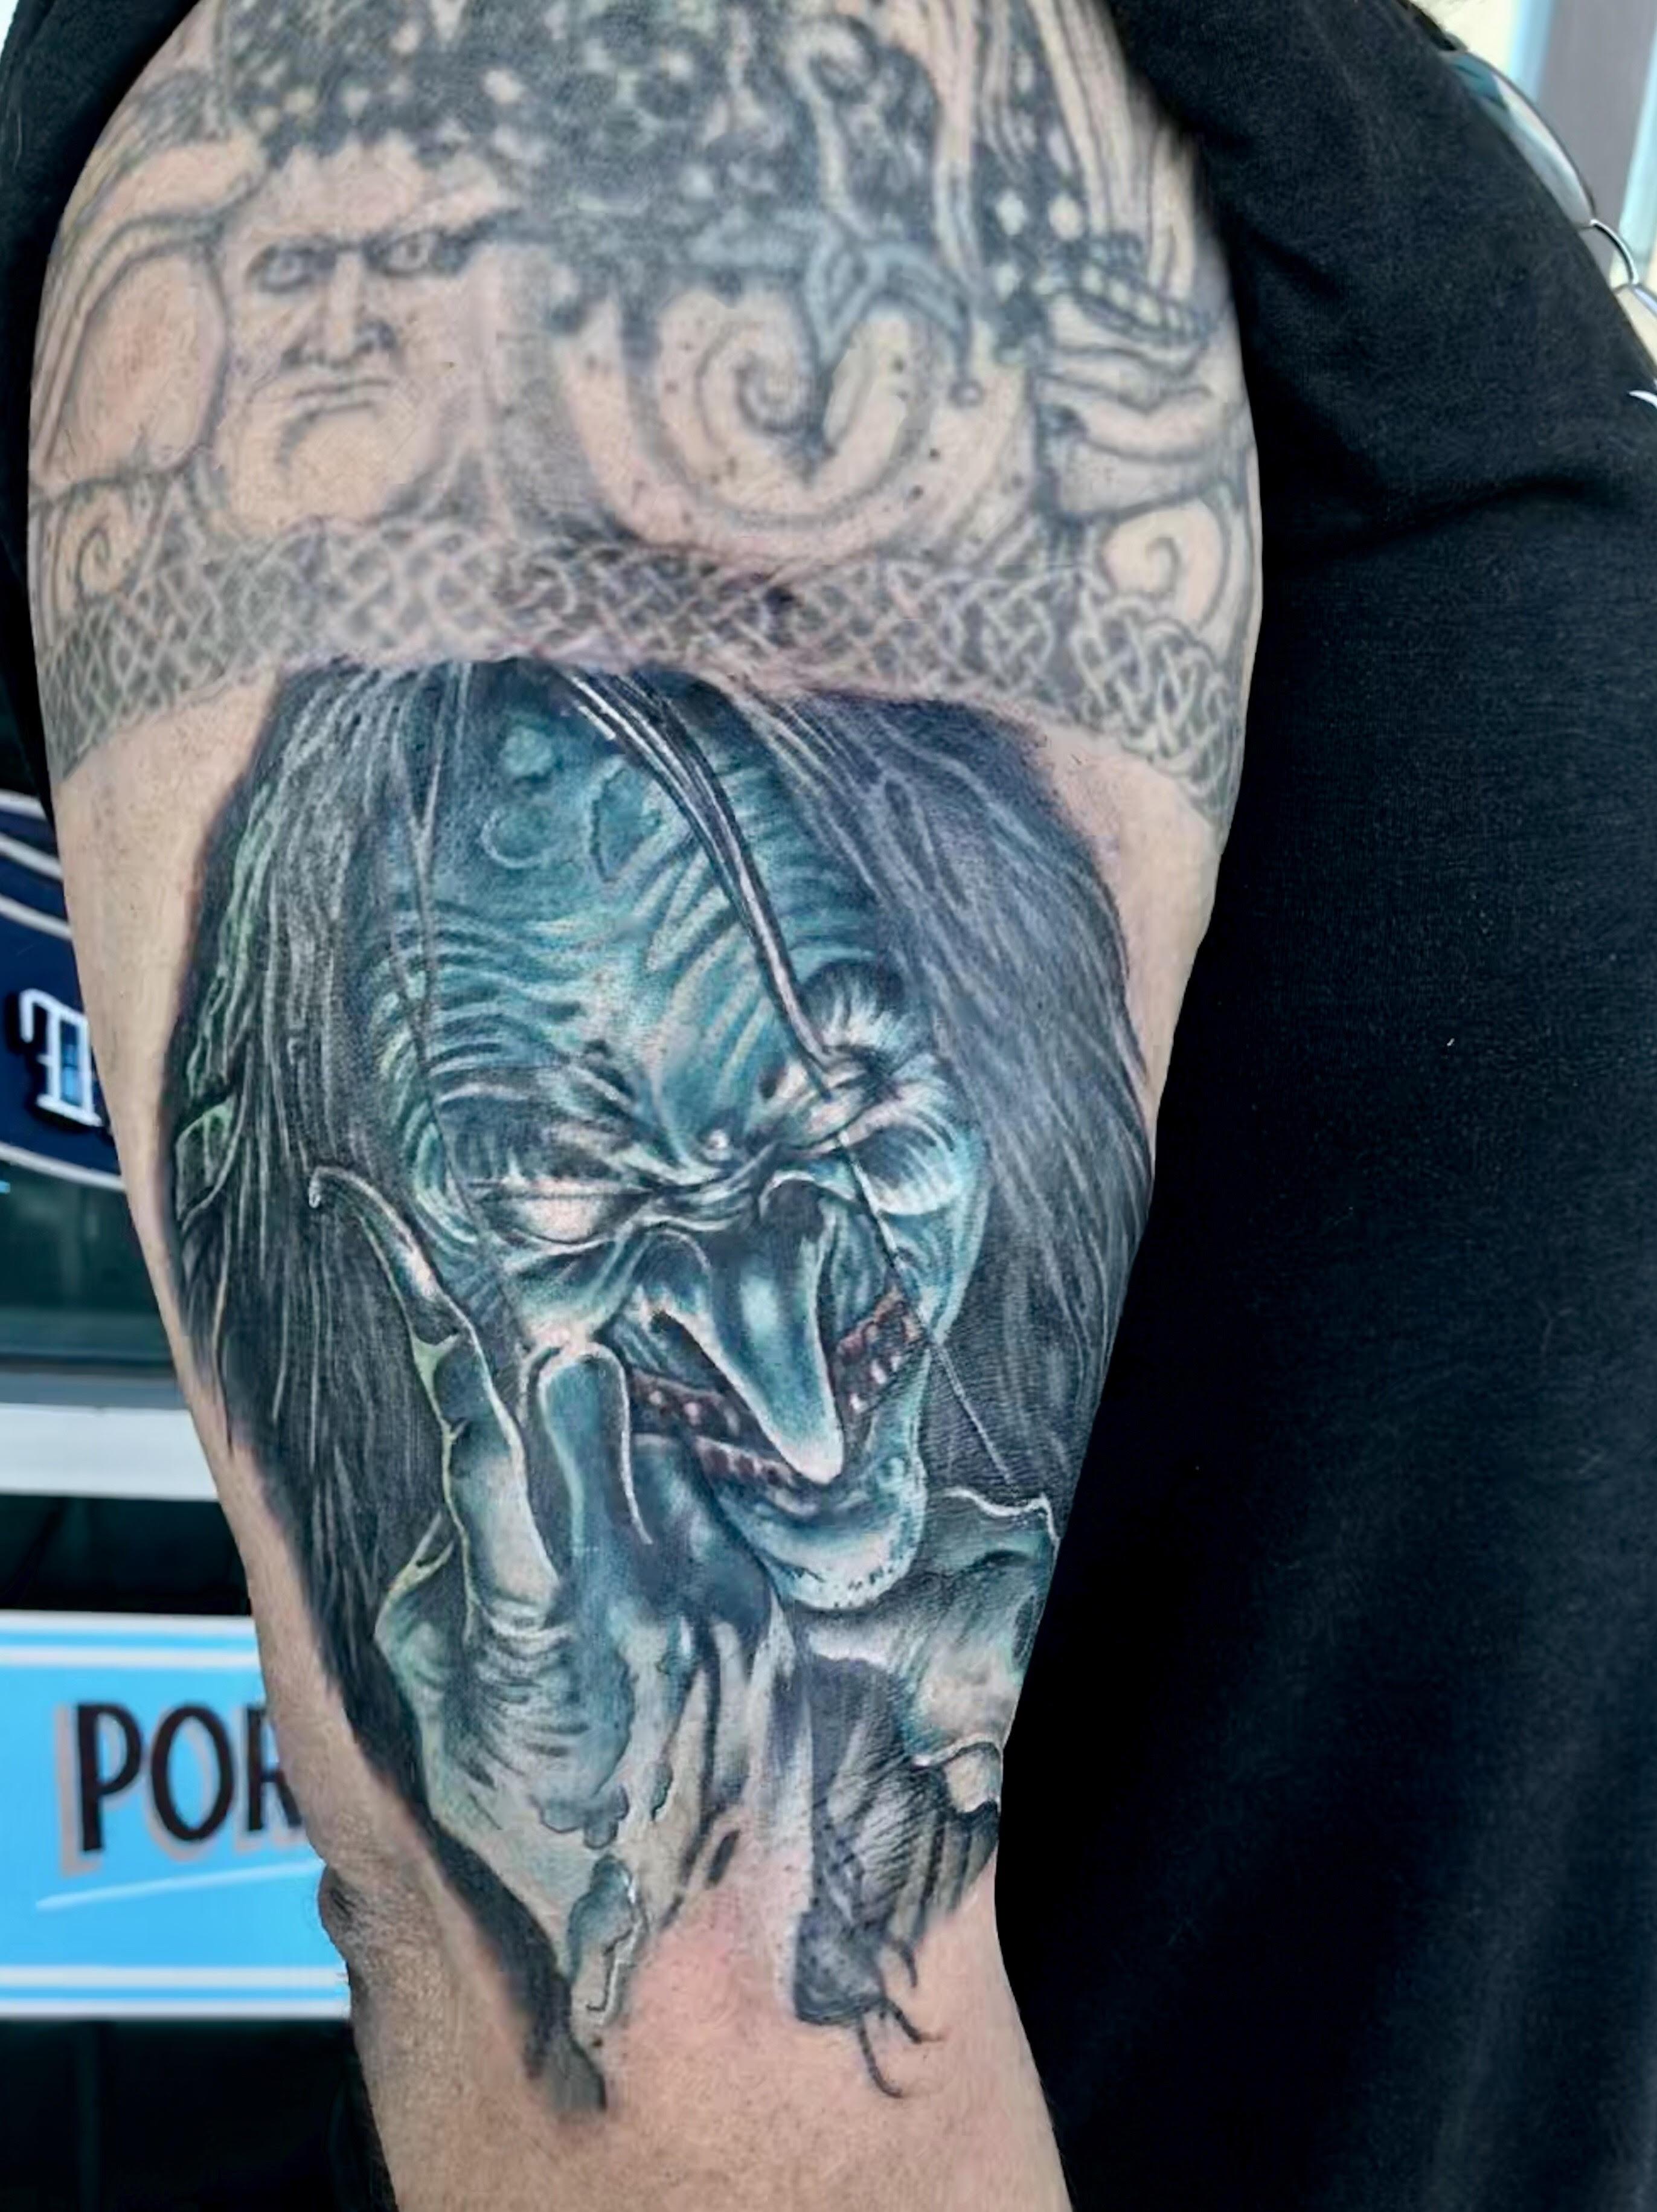 Creepy Tattoo by Krystof